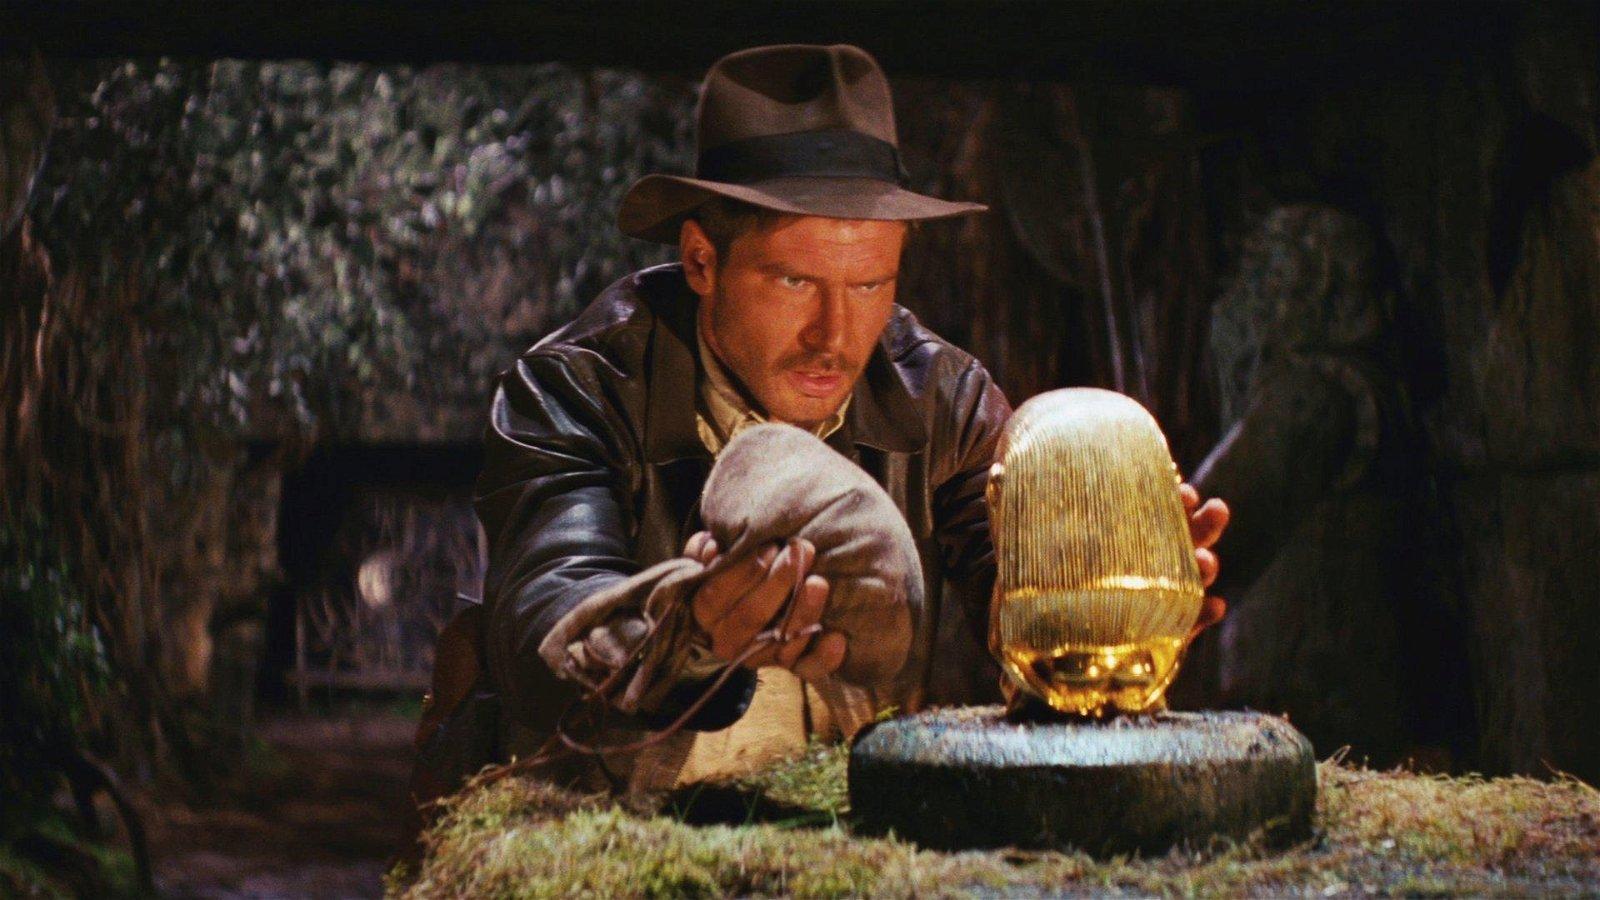 Bethesda Teases New Indiana Jones Game